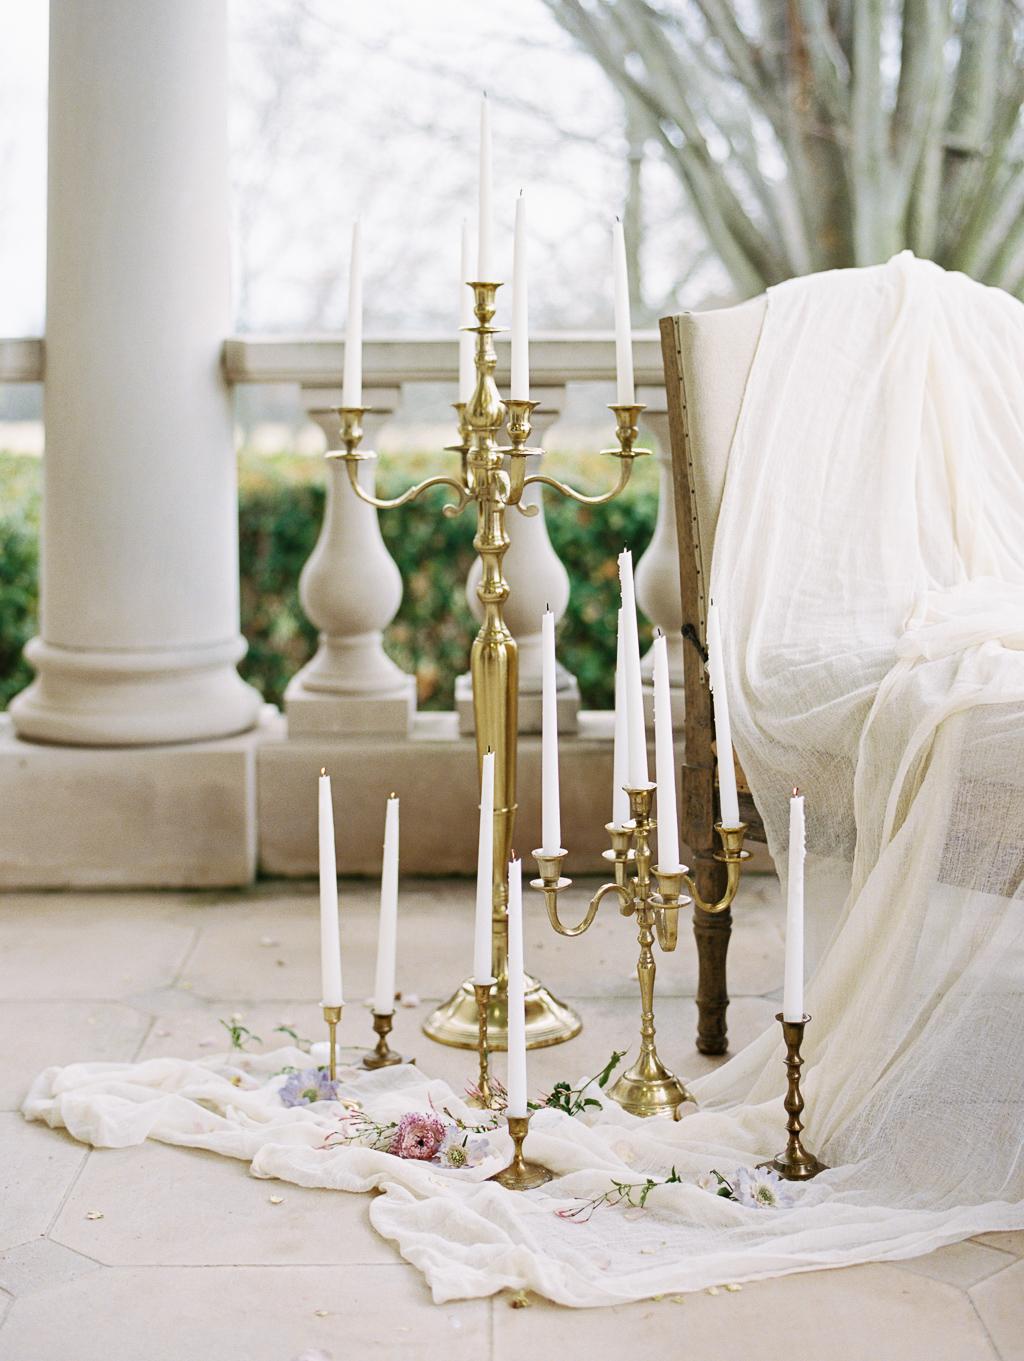 dc-wedding-planner-adriana-marie-events